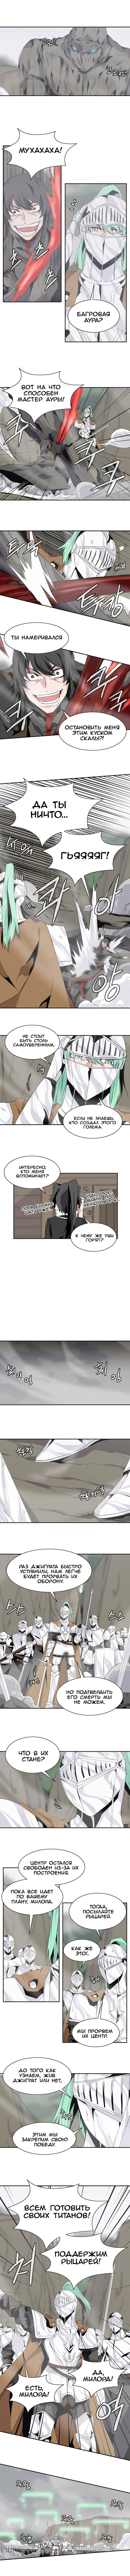 https://r1.ninemanga.com/comics/pic2/48/28784/325295/1495602798724.jpg Page 1